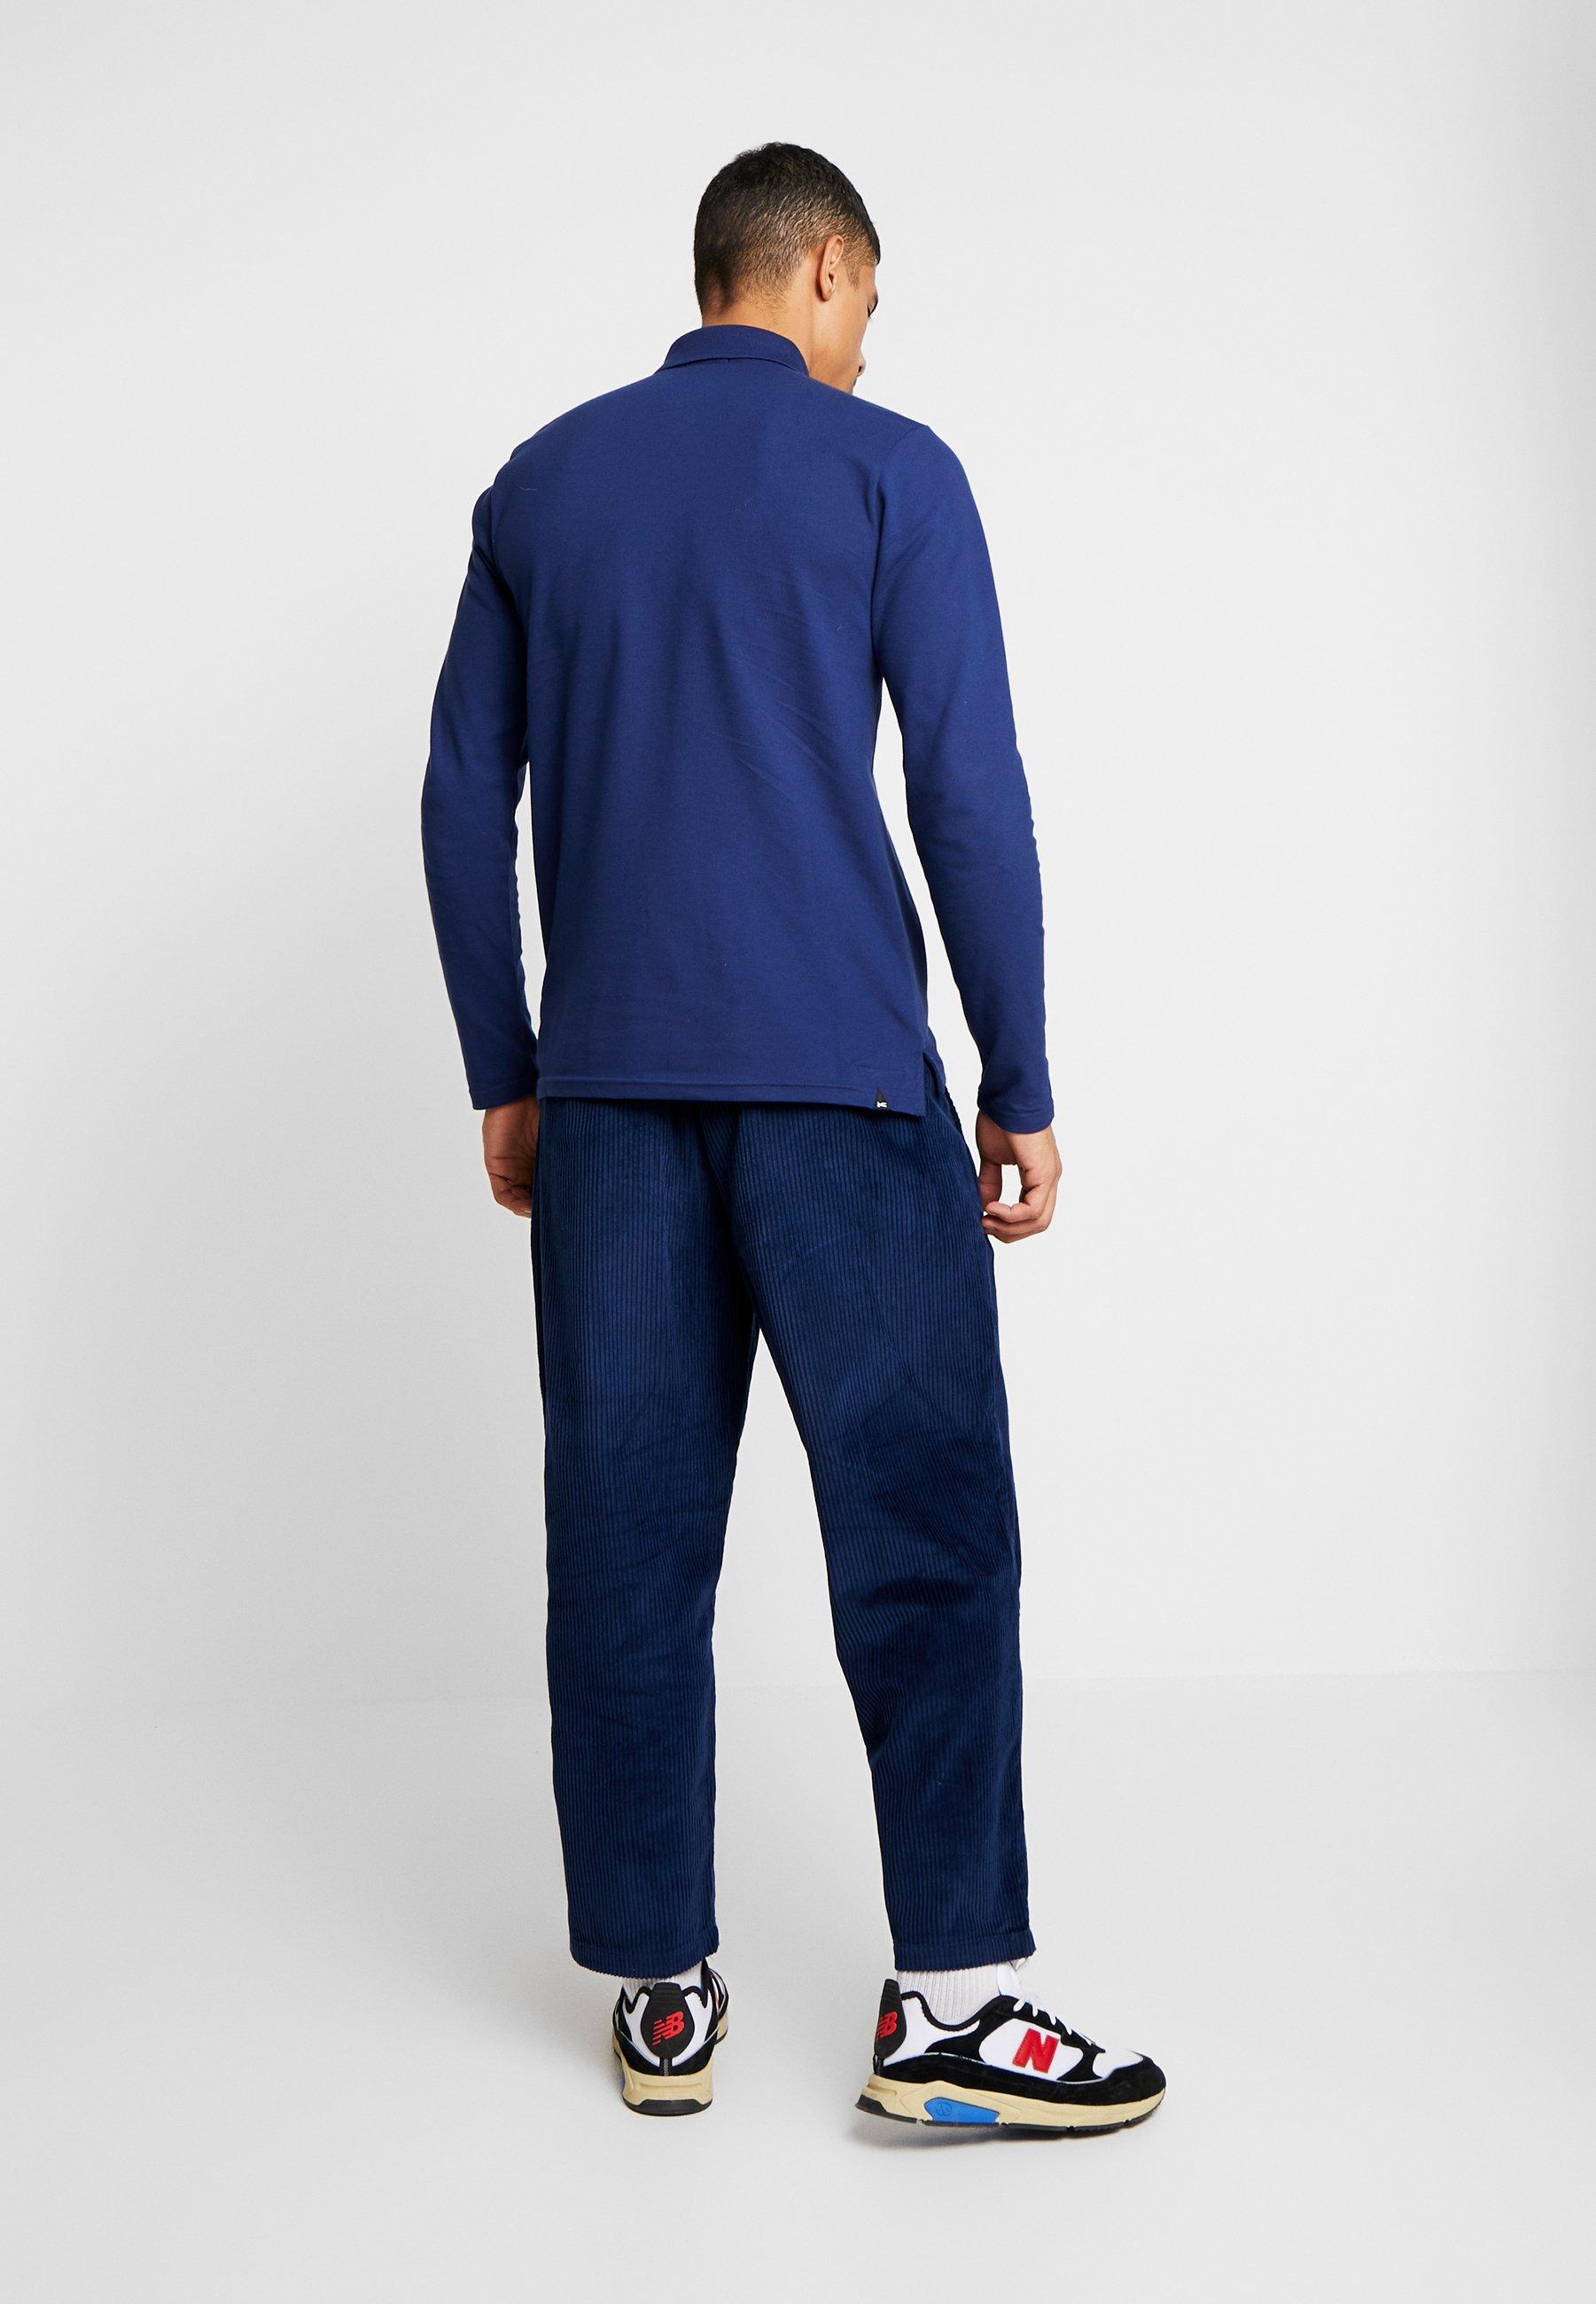 Cool Shopping Miesten vaatteet Sarja dfKJIUp97454sfGHYHD Denham HARRY PANT Kangashousut medieval blue